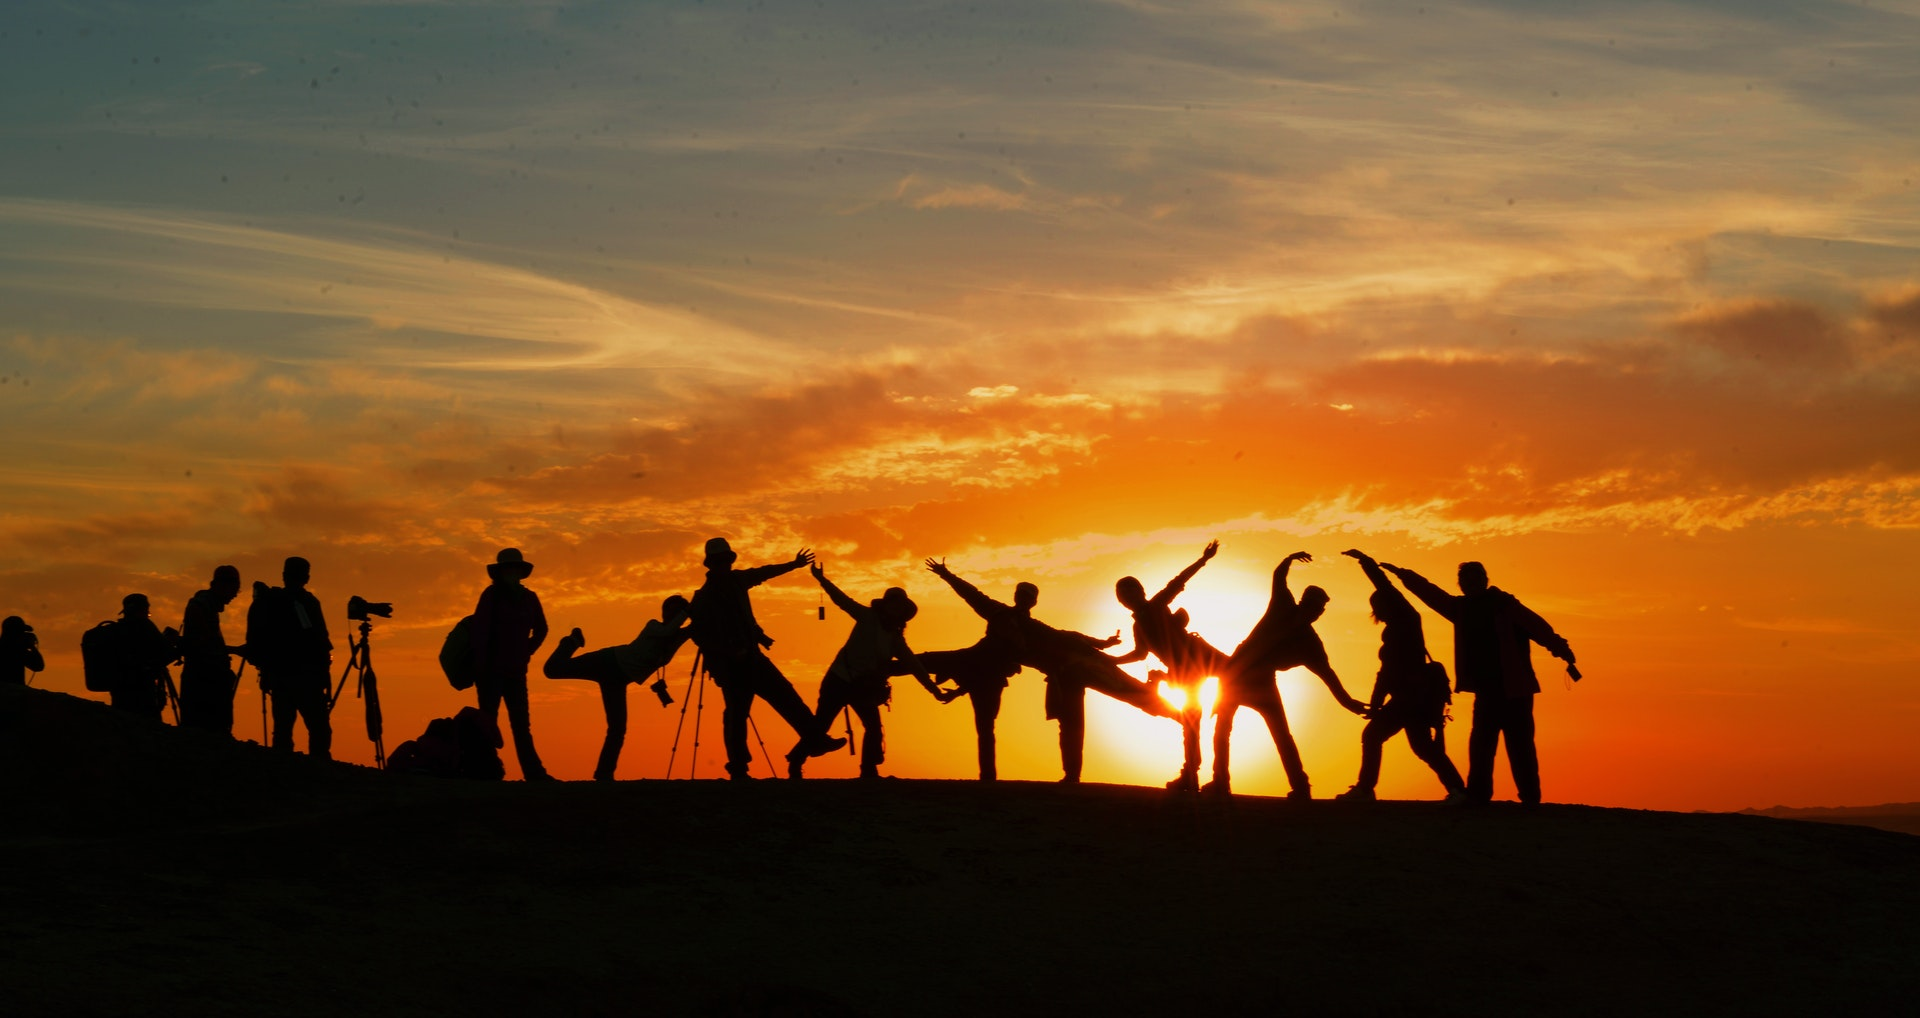 sunset people shadows